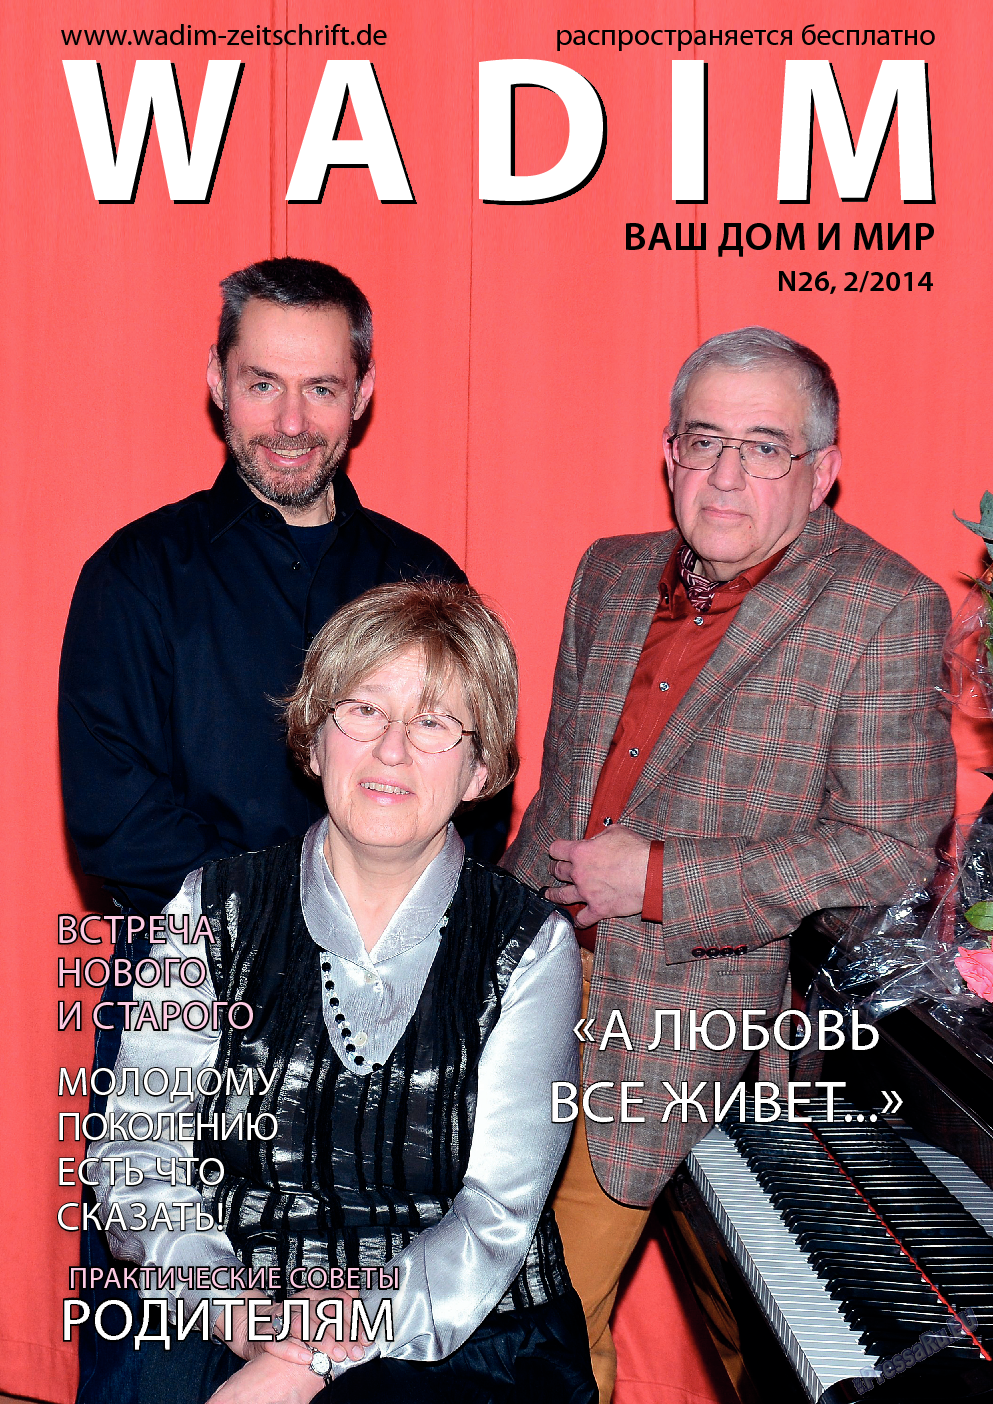 Wadim (журнал). 2014 год, номер 2, стр. 1